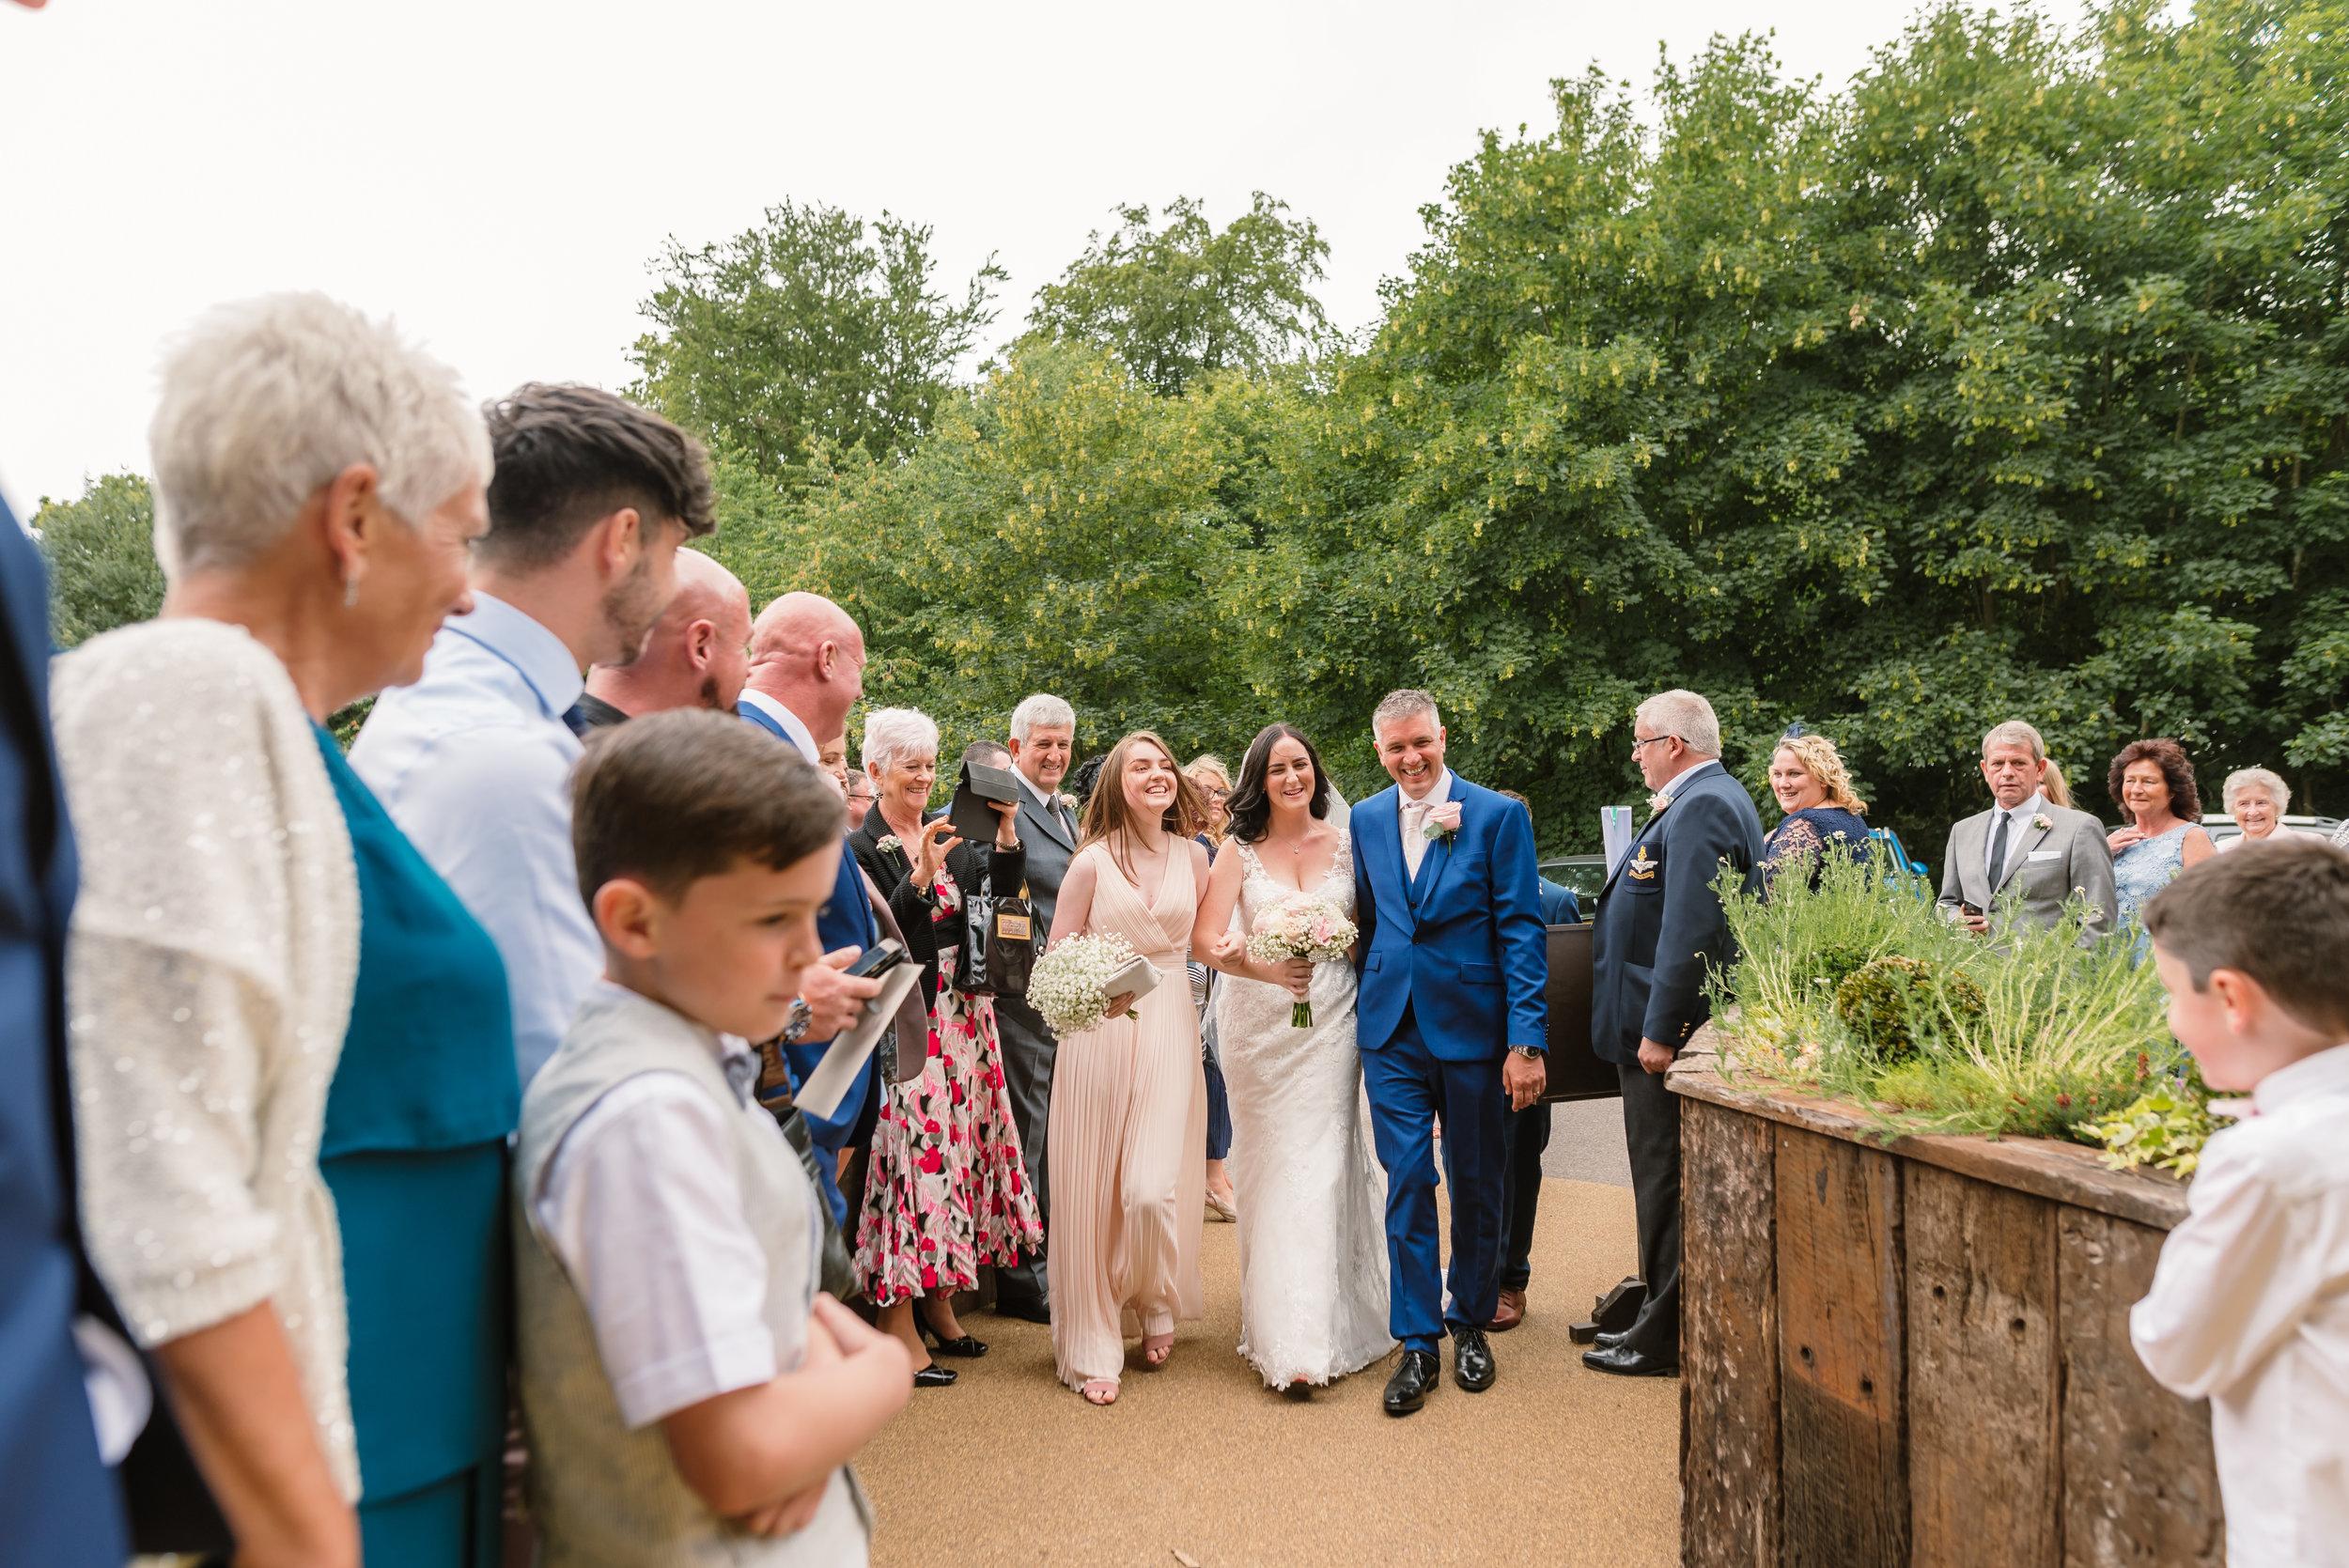 Sarah-Fishlock-Photography : Hampshire-wedding-photographer-hampshire : fleet-wedding-photographer-fleet : Meade-Hall-Wedding-Photographer : Meade-Hall-Wedding-Photos-595.jpg